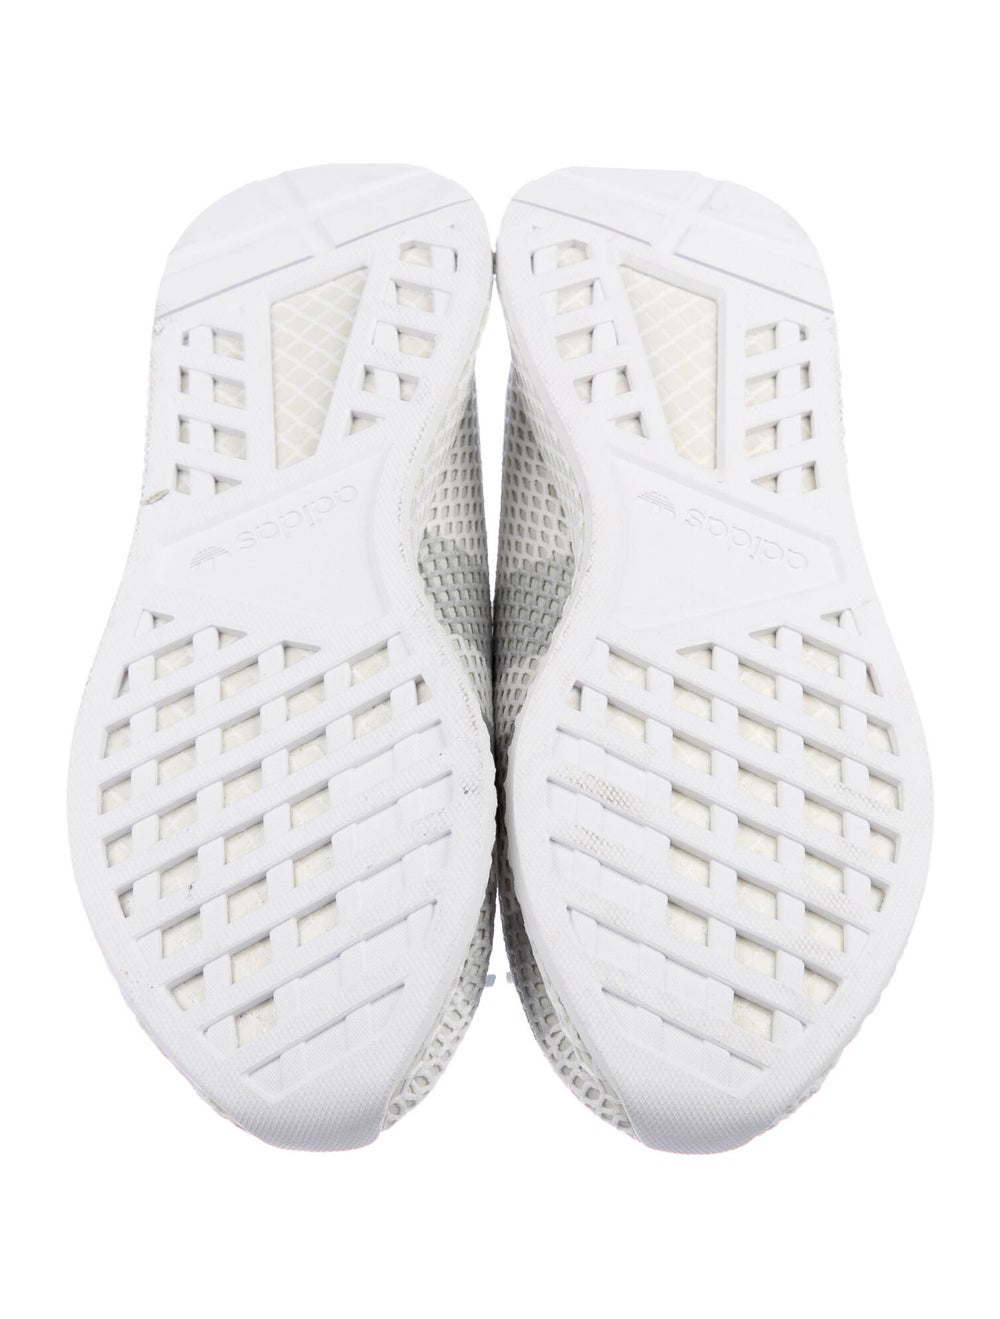 Adidas Deerupt Sneakers White - image 5